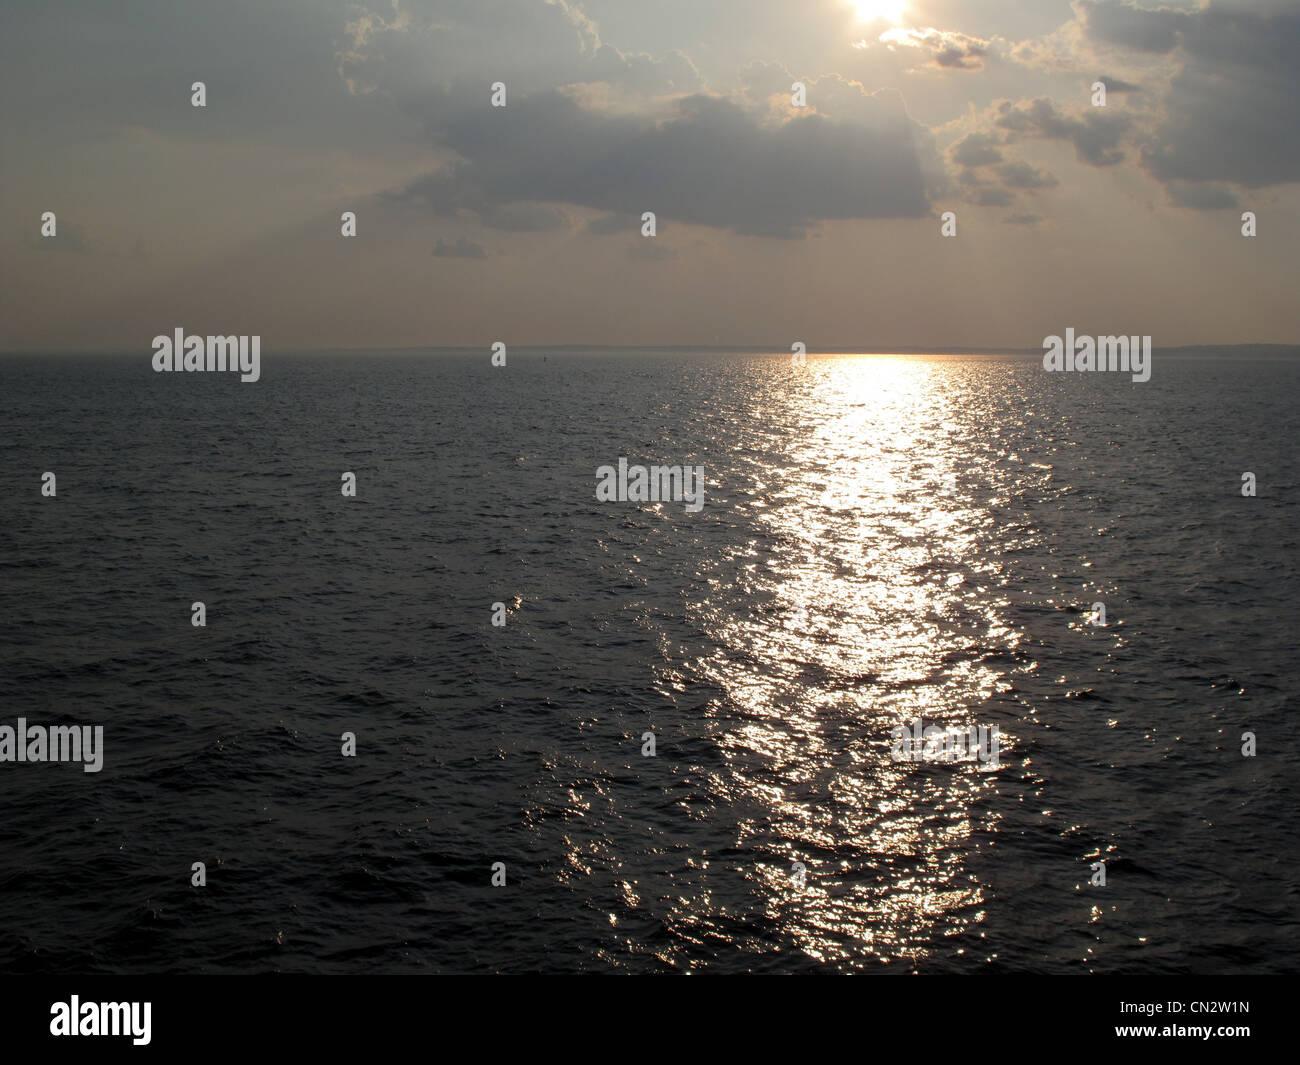 Atlantic ocean, sunset - Stock Image